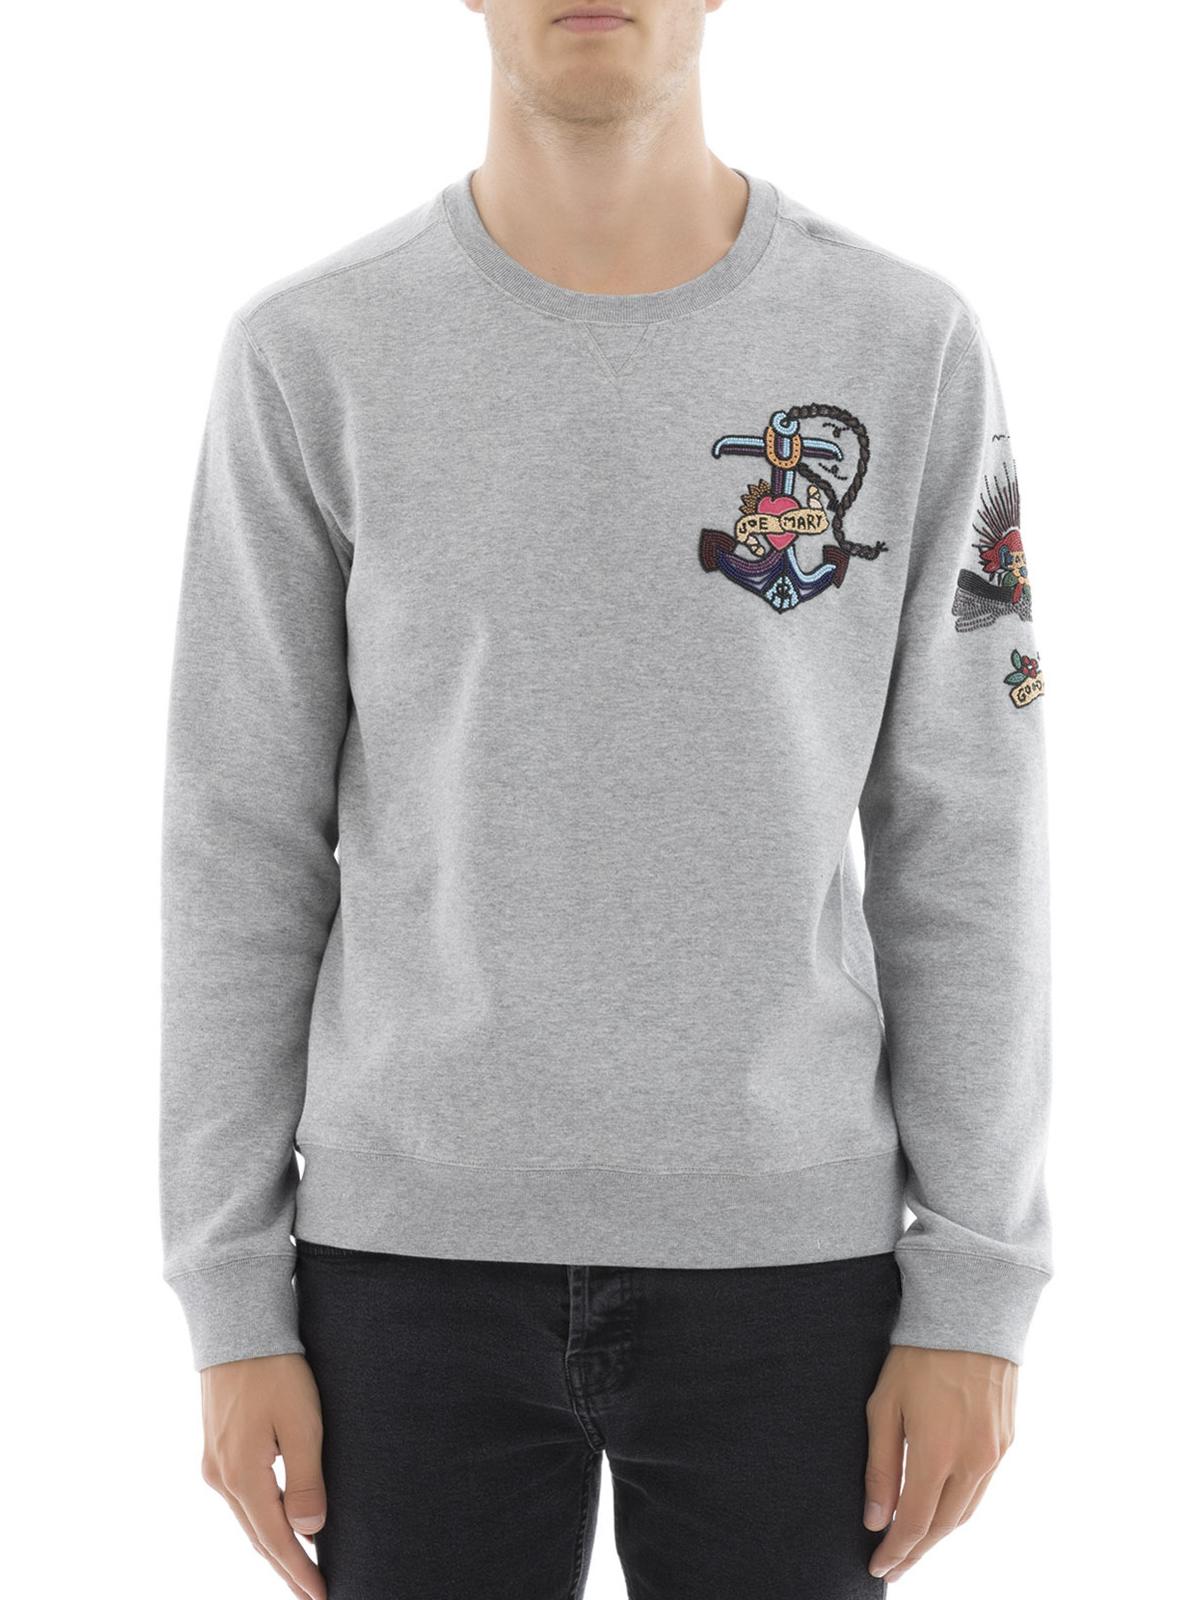 Gris amp; Sweat Shirts Pulls Valentino Sweatshirts Online Tz4qn55xgY